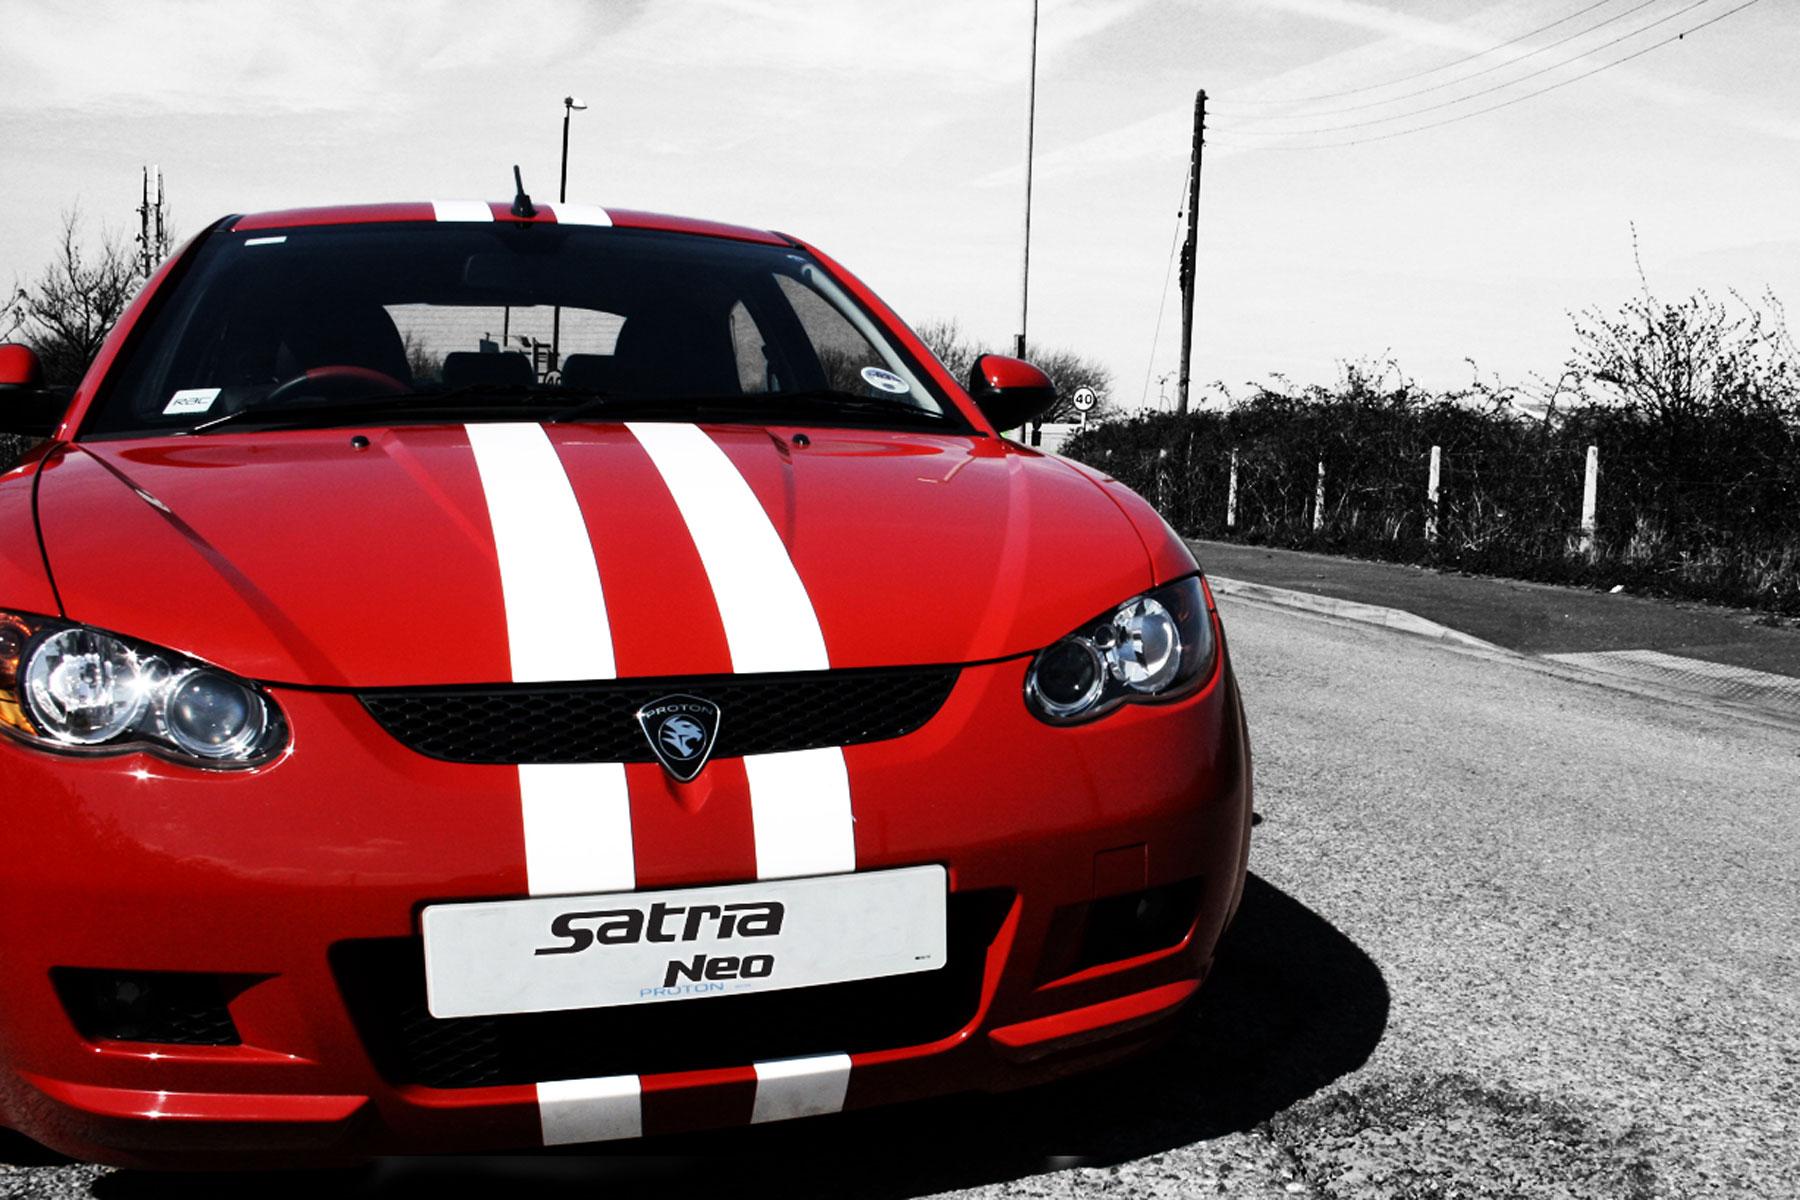 Proton Satria Neo Sport